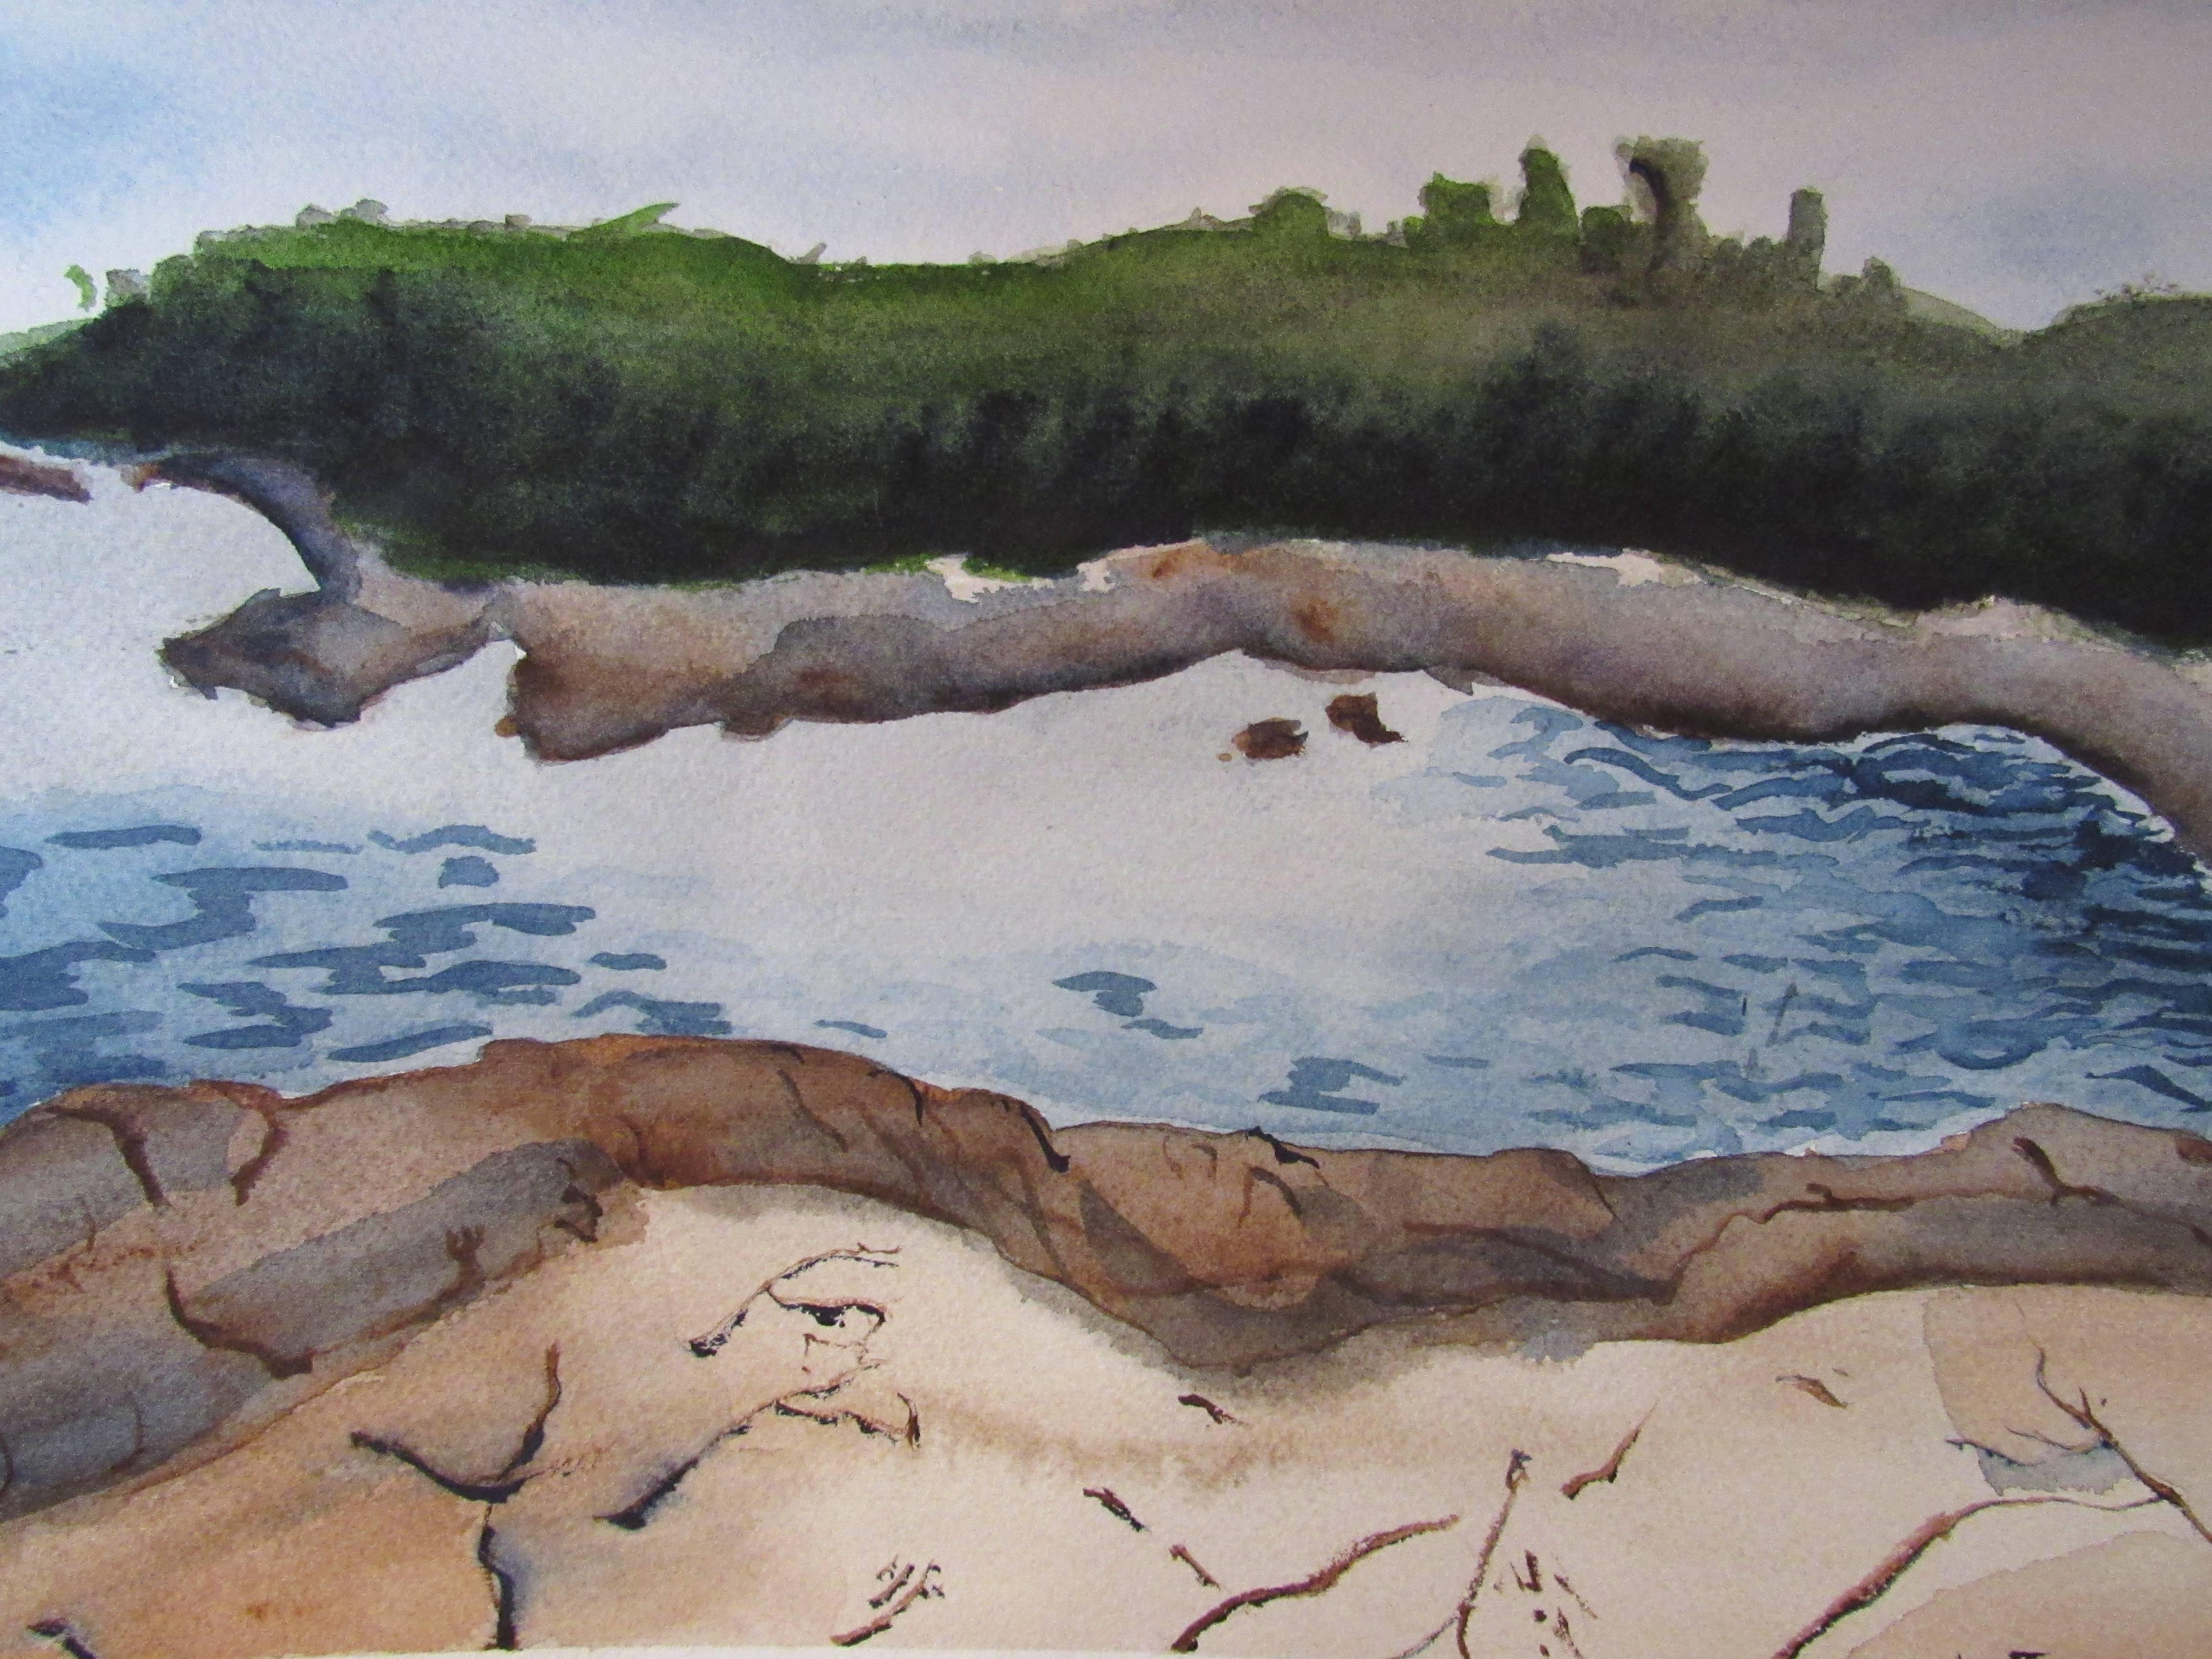 Emilio Torres-Roseberry Watercolor - Age 17